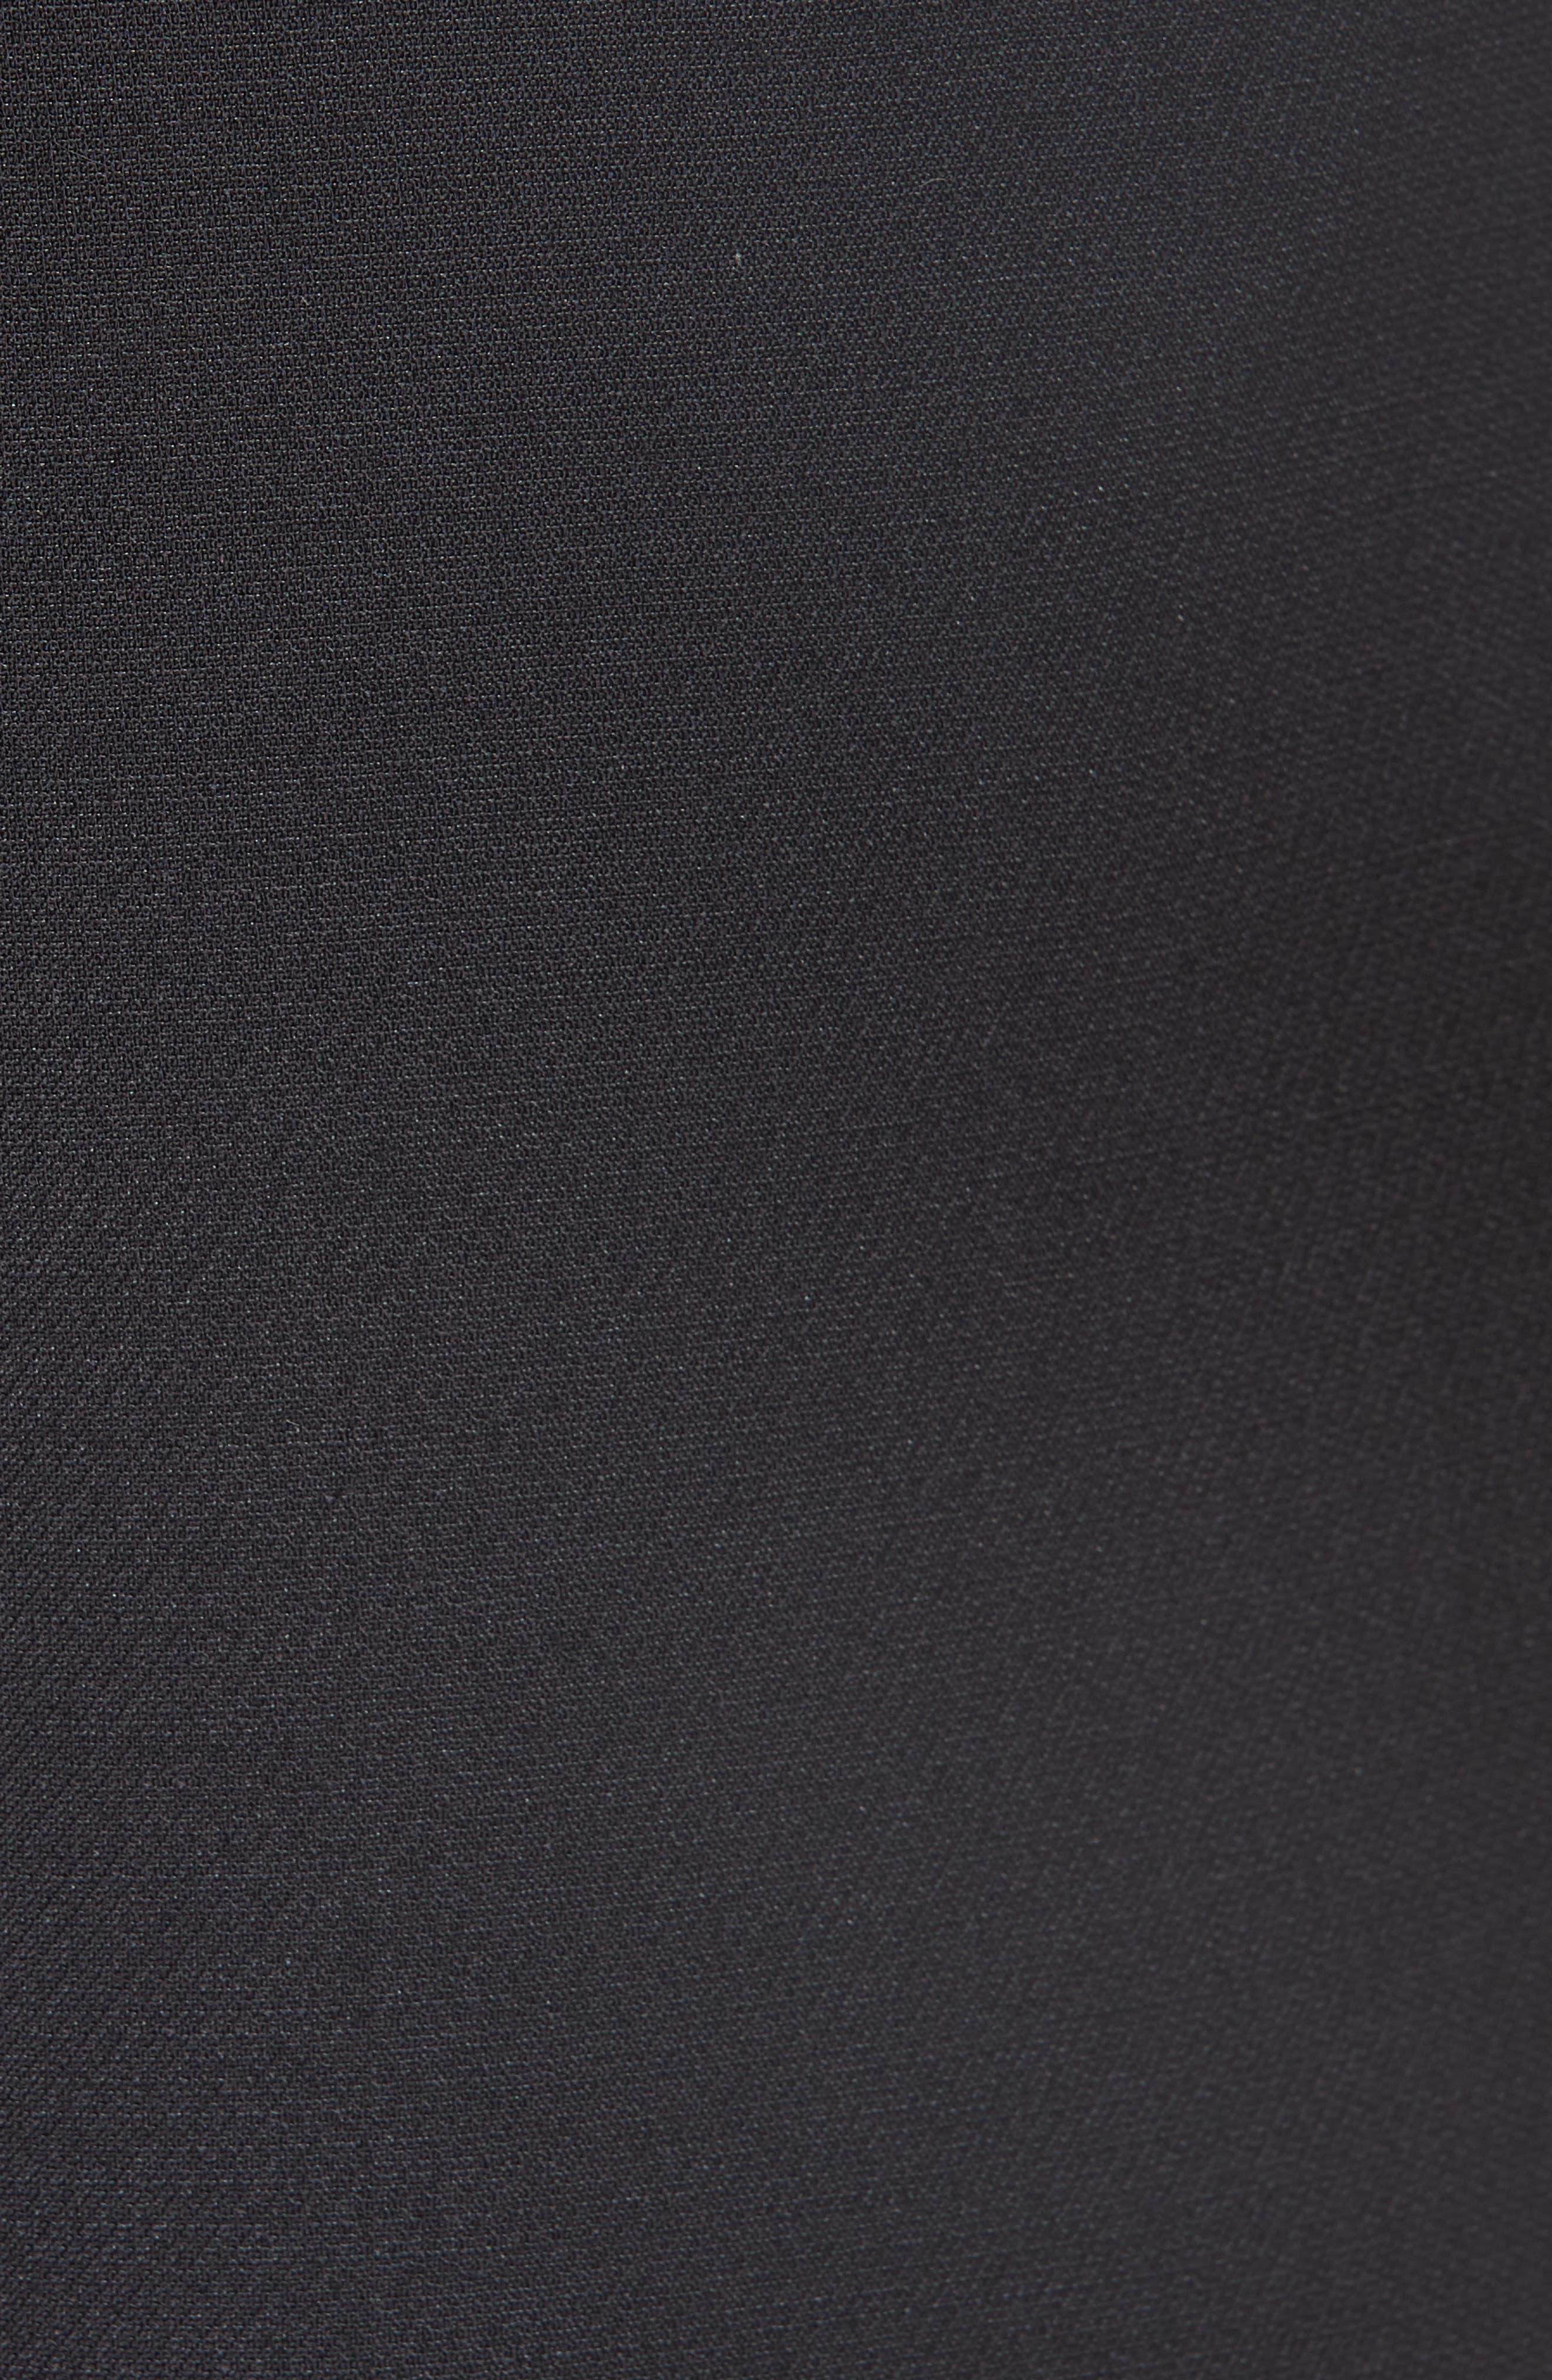 Wool & Silk Culottes,                             Alternate thumbnail 5, color,                             001